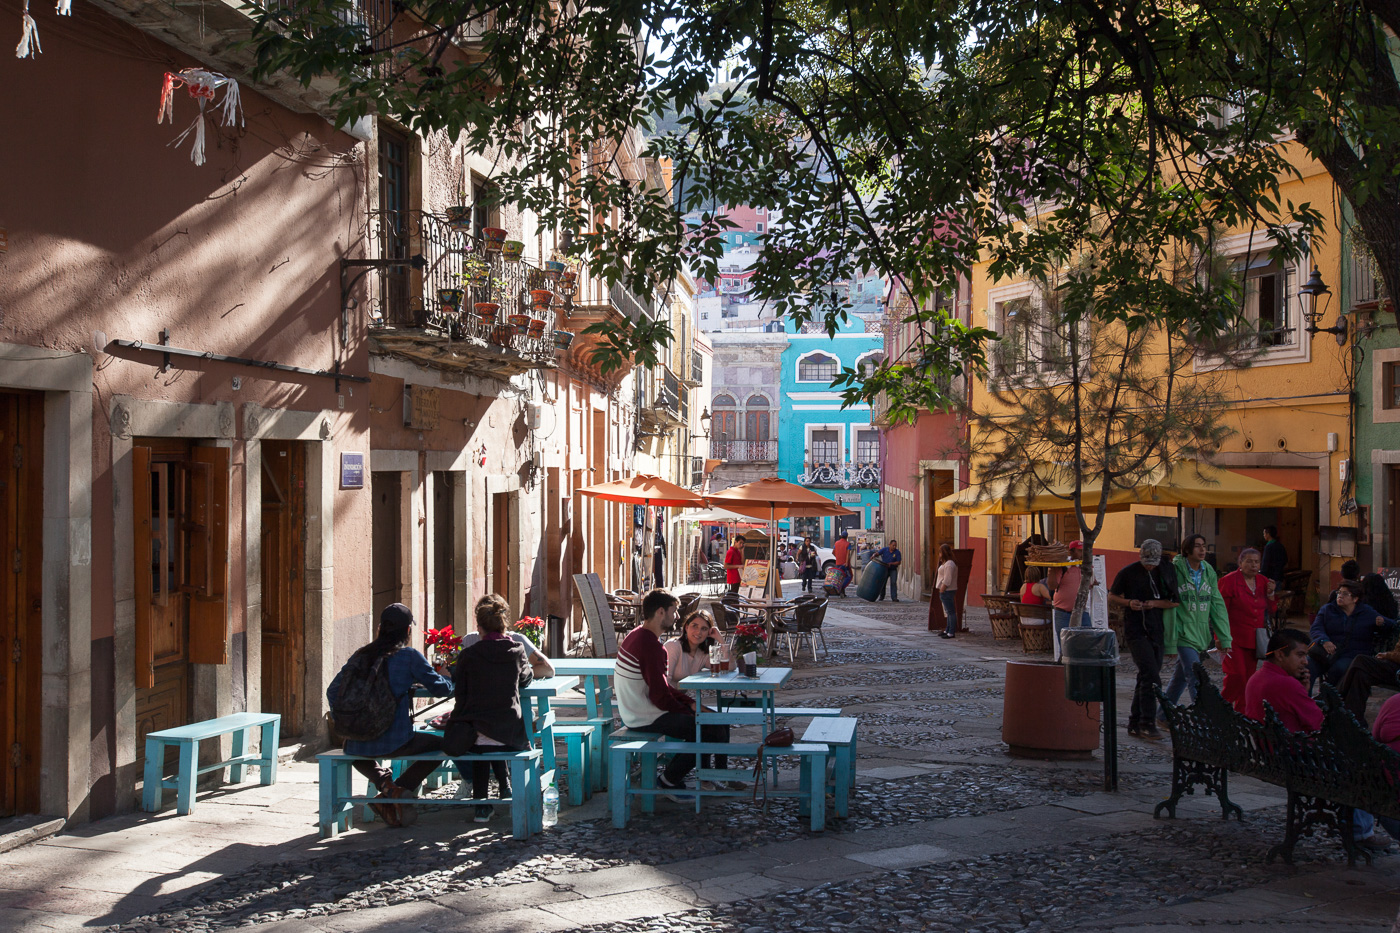 Guanajuato - en sølvmineby fra kolonitiden